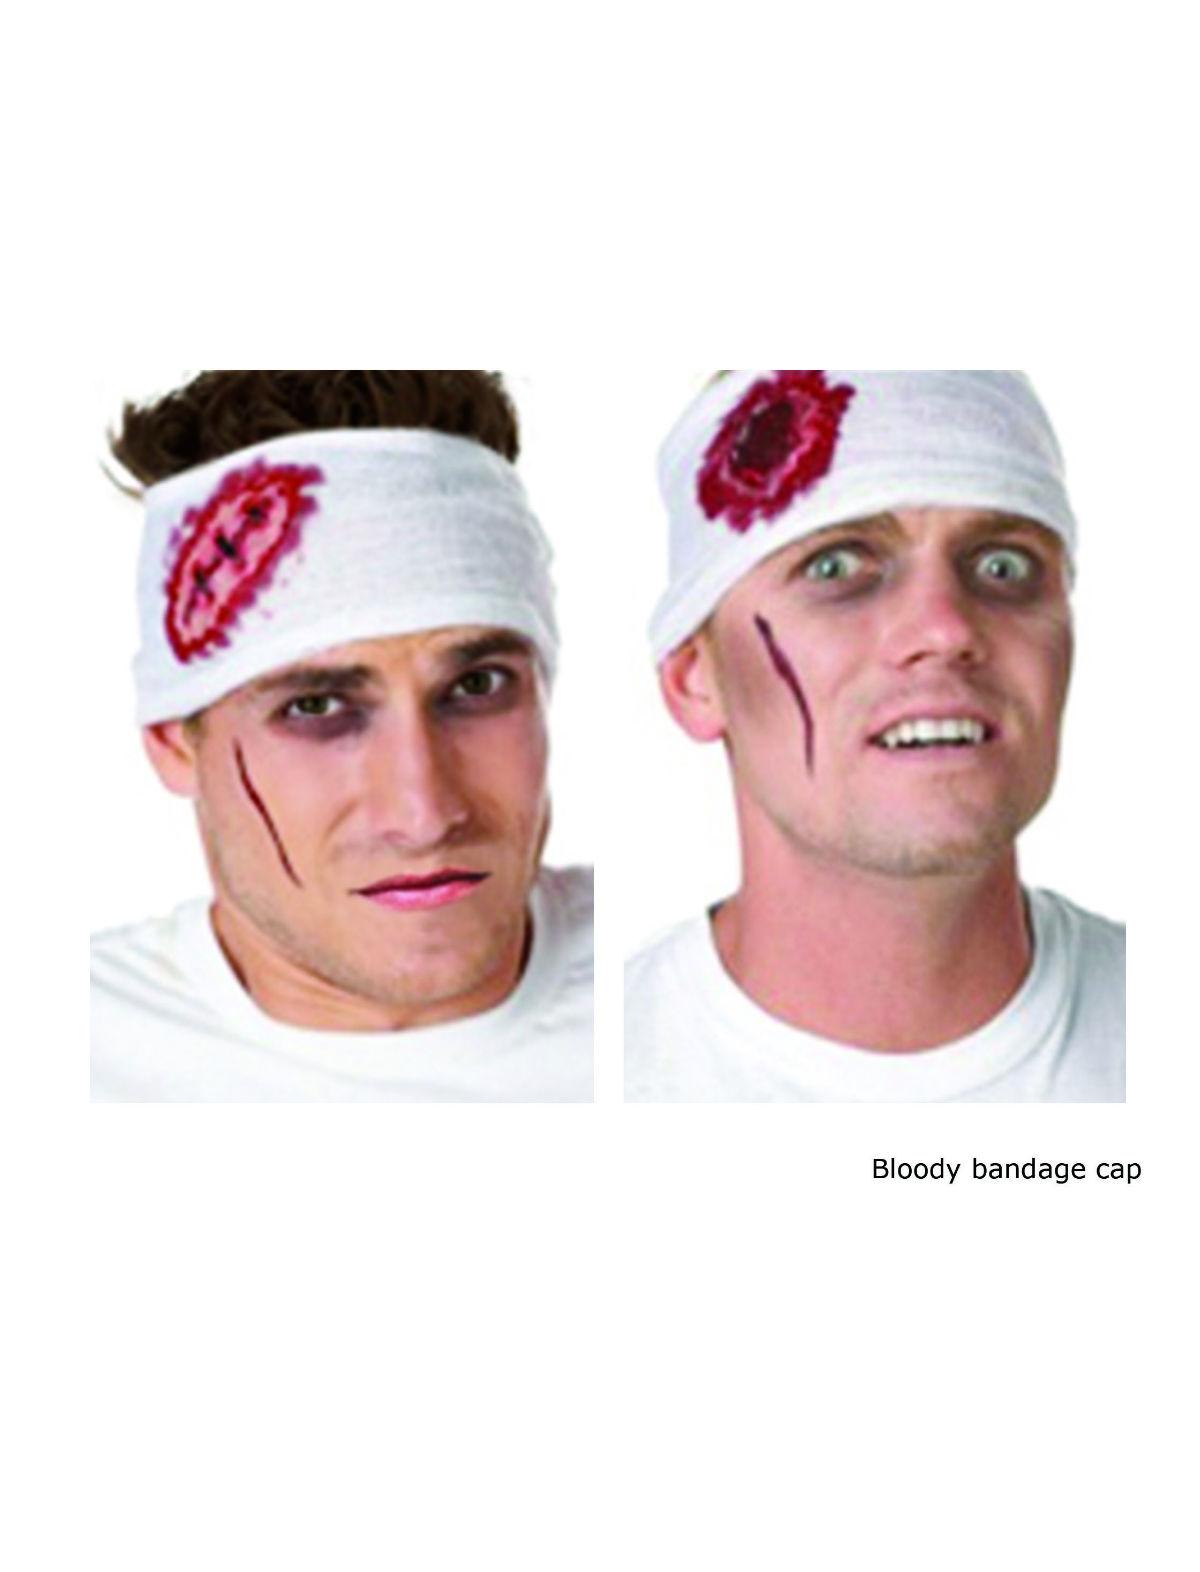 Kopfverband mit Wunde